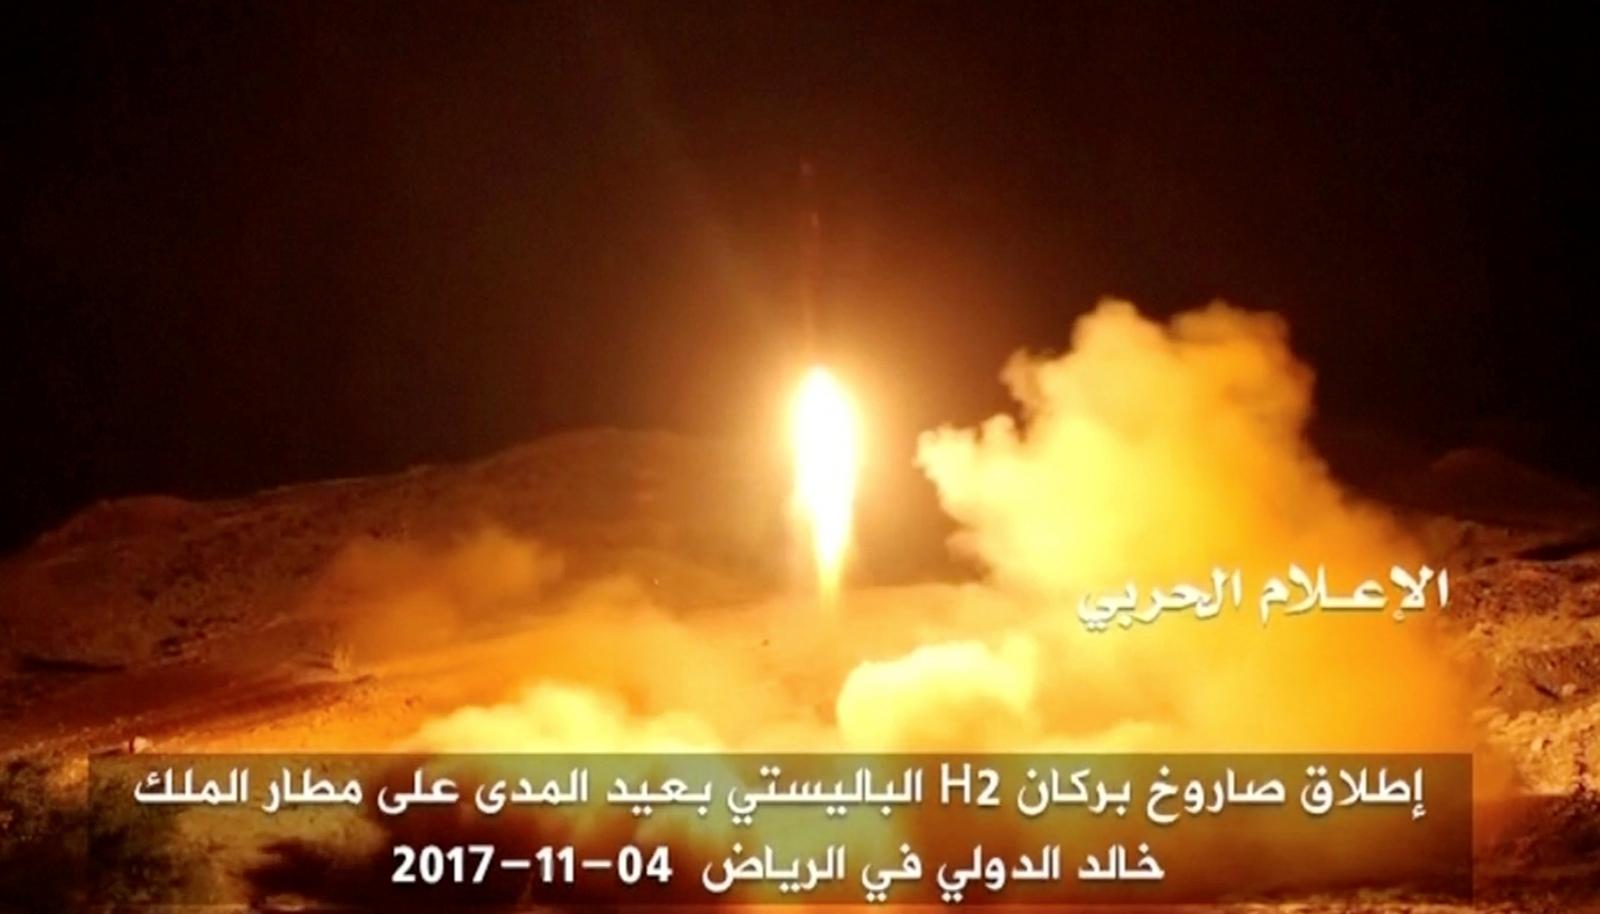 Yemen's Houthi rebels fire ballistic missile